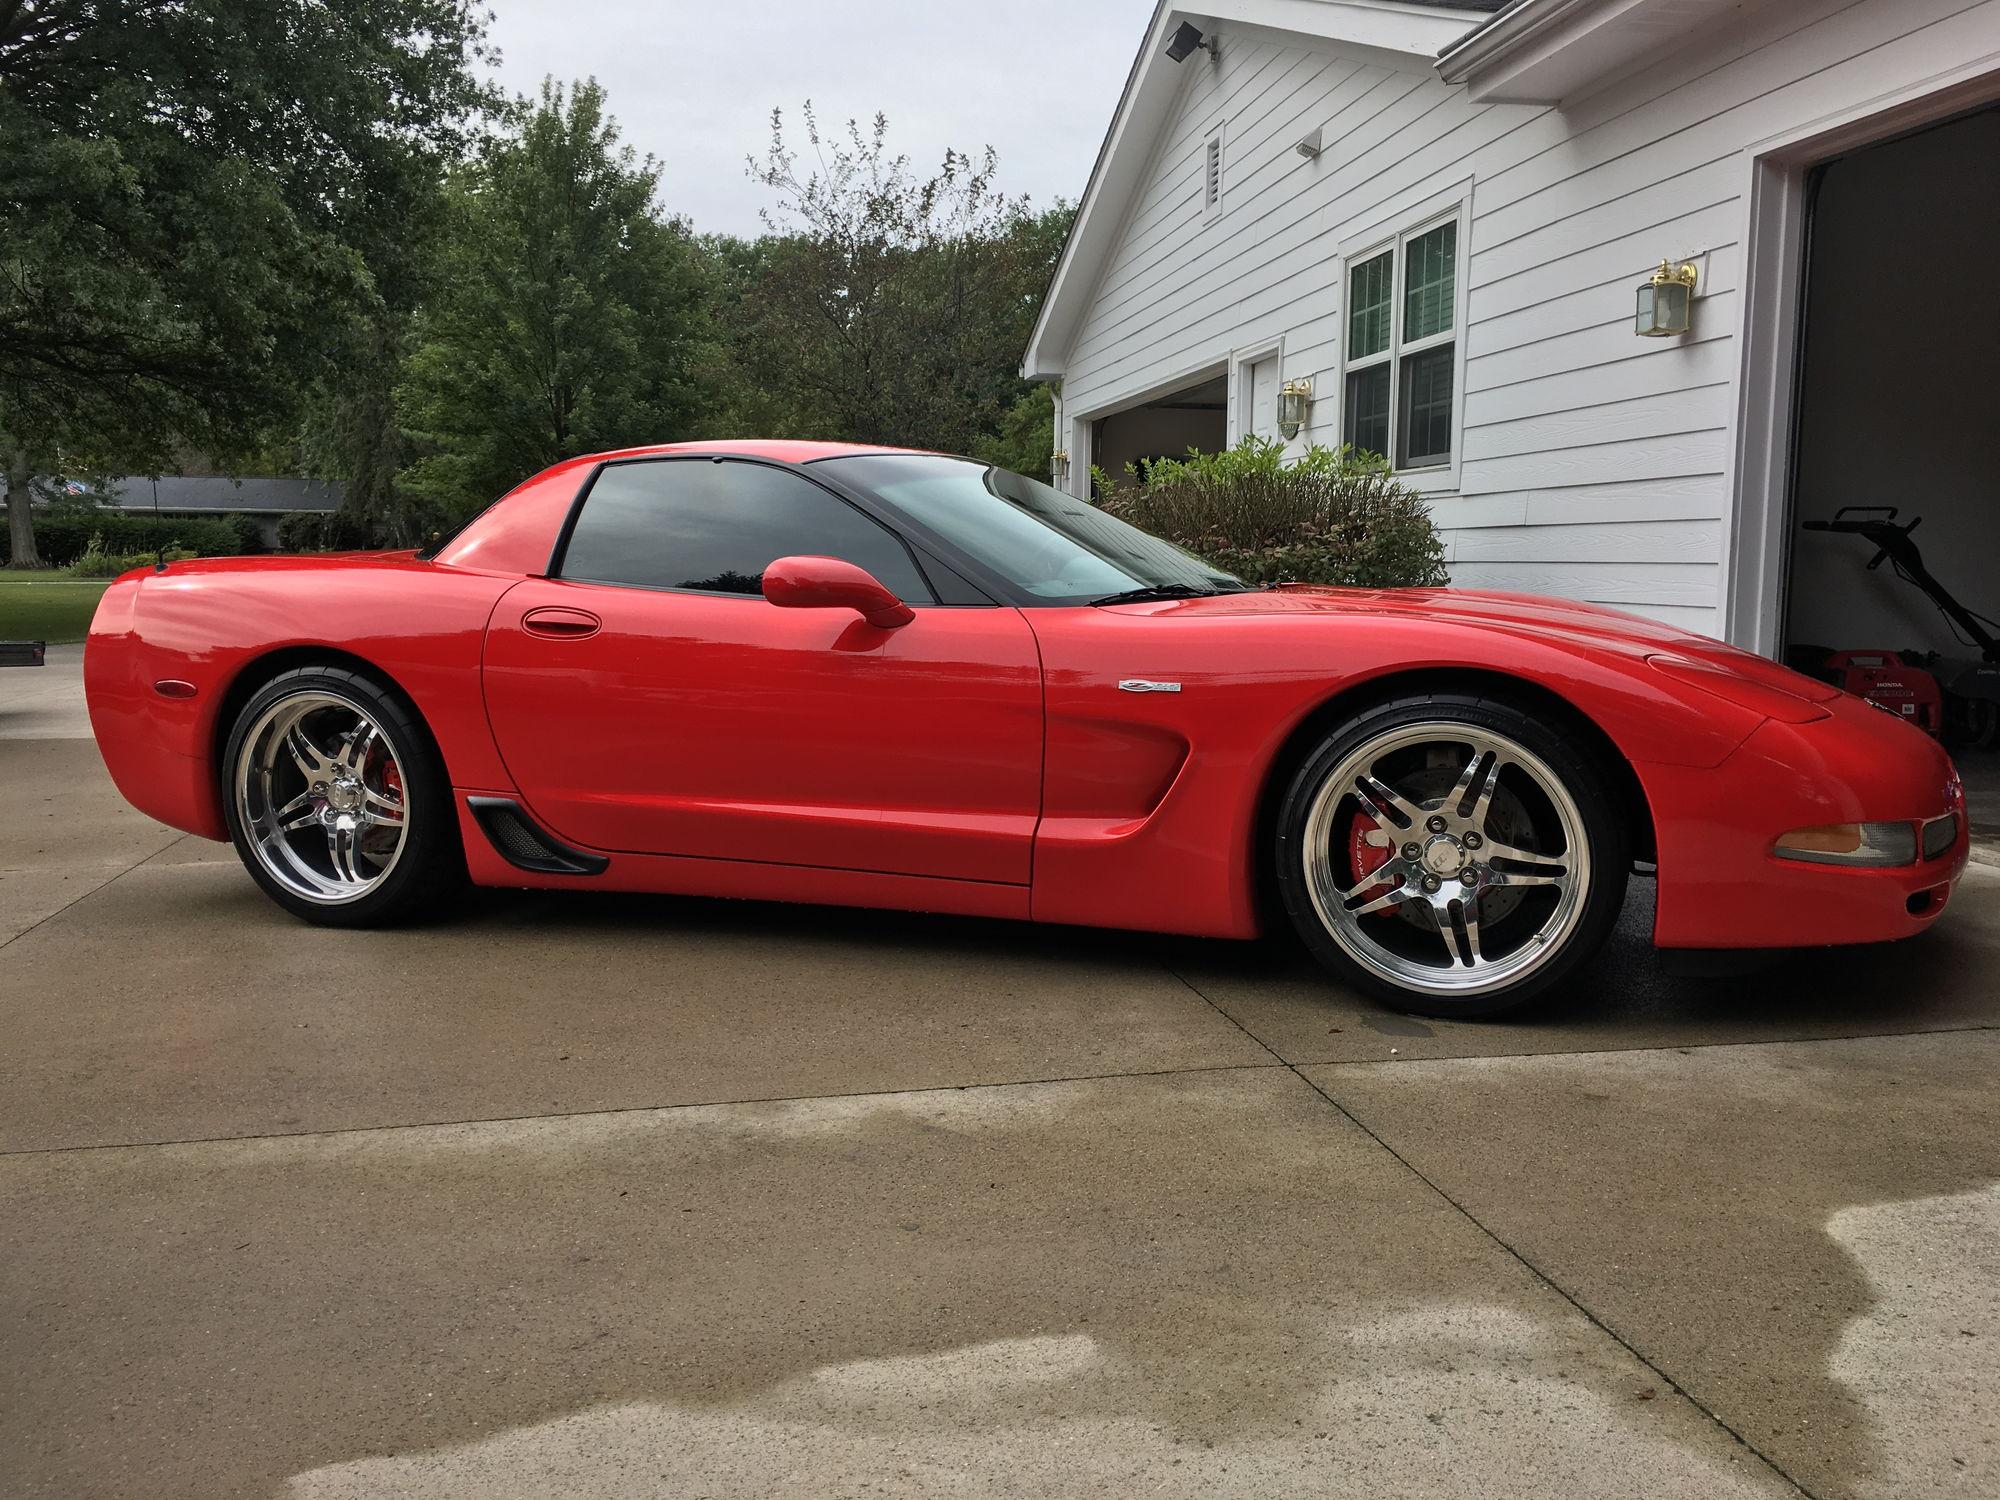 fs for sale 2004 zo6 for sale corvetteforum chevrolet corvette forum discussion. Black Bedroom Furniture Sets. Home Design Ideas